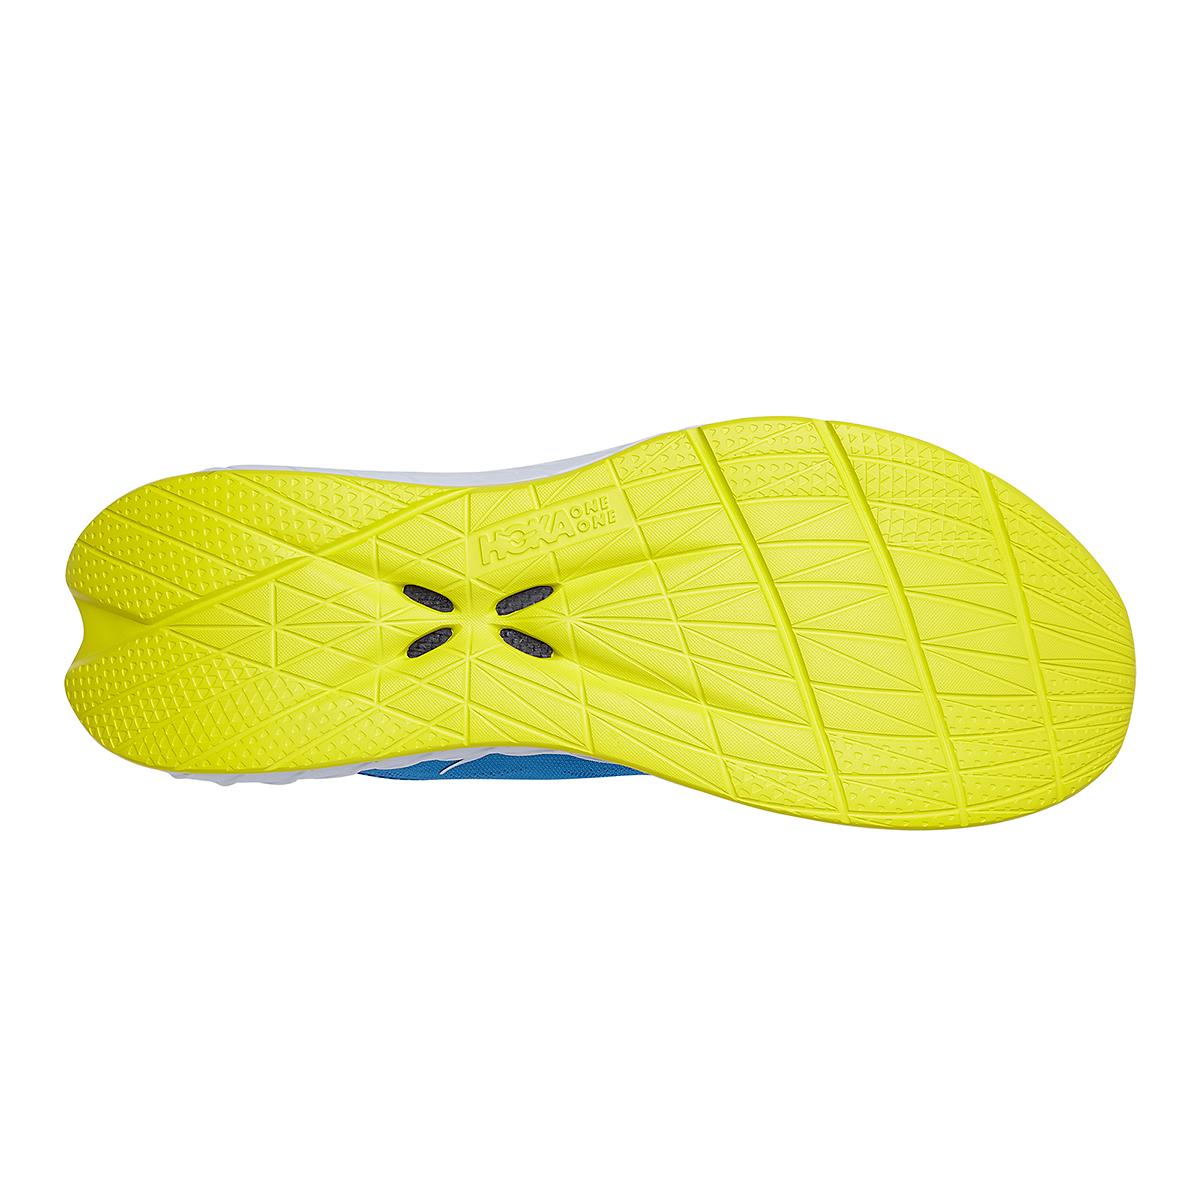 Men's Hoka One One Carbon X 2 Running Shoe - Color: Diva Blue/Citron - Size: 7 - Width: Regular, Diva Blue/Citron, large, image 6